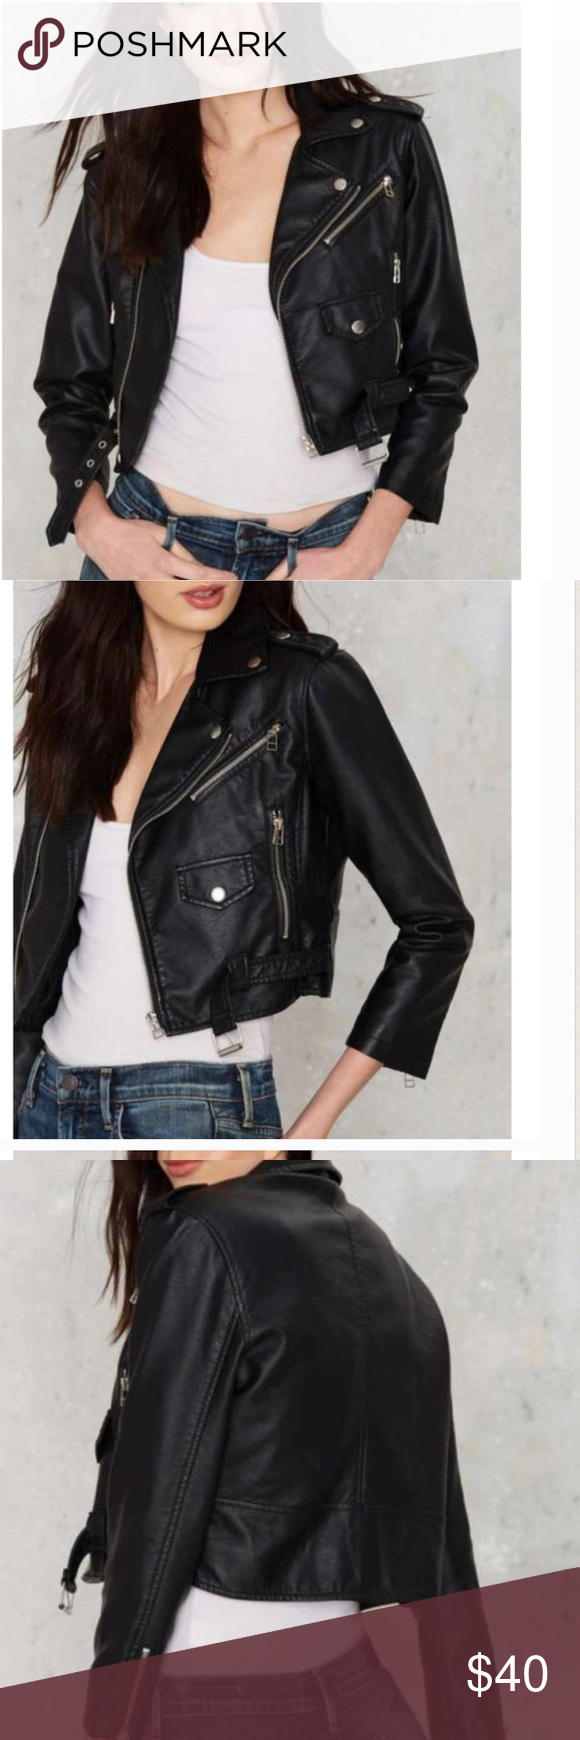 #880🦁🔵 Vegan jacket New with tags Nasty Gal Jackets & Coats